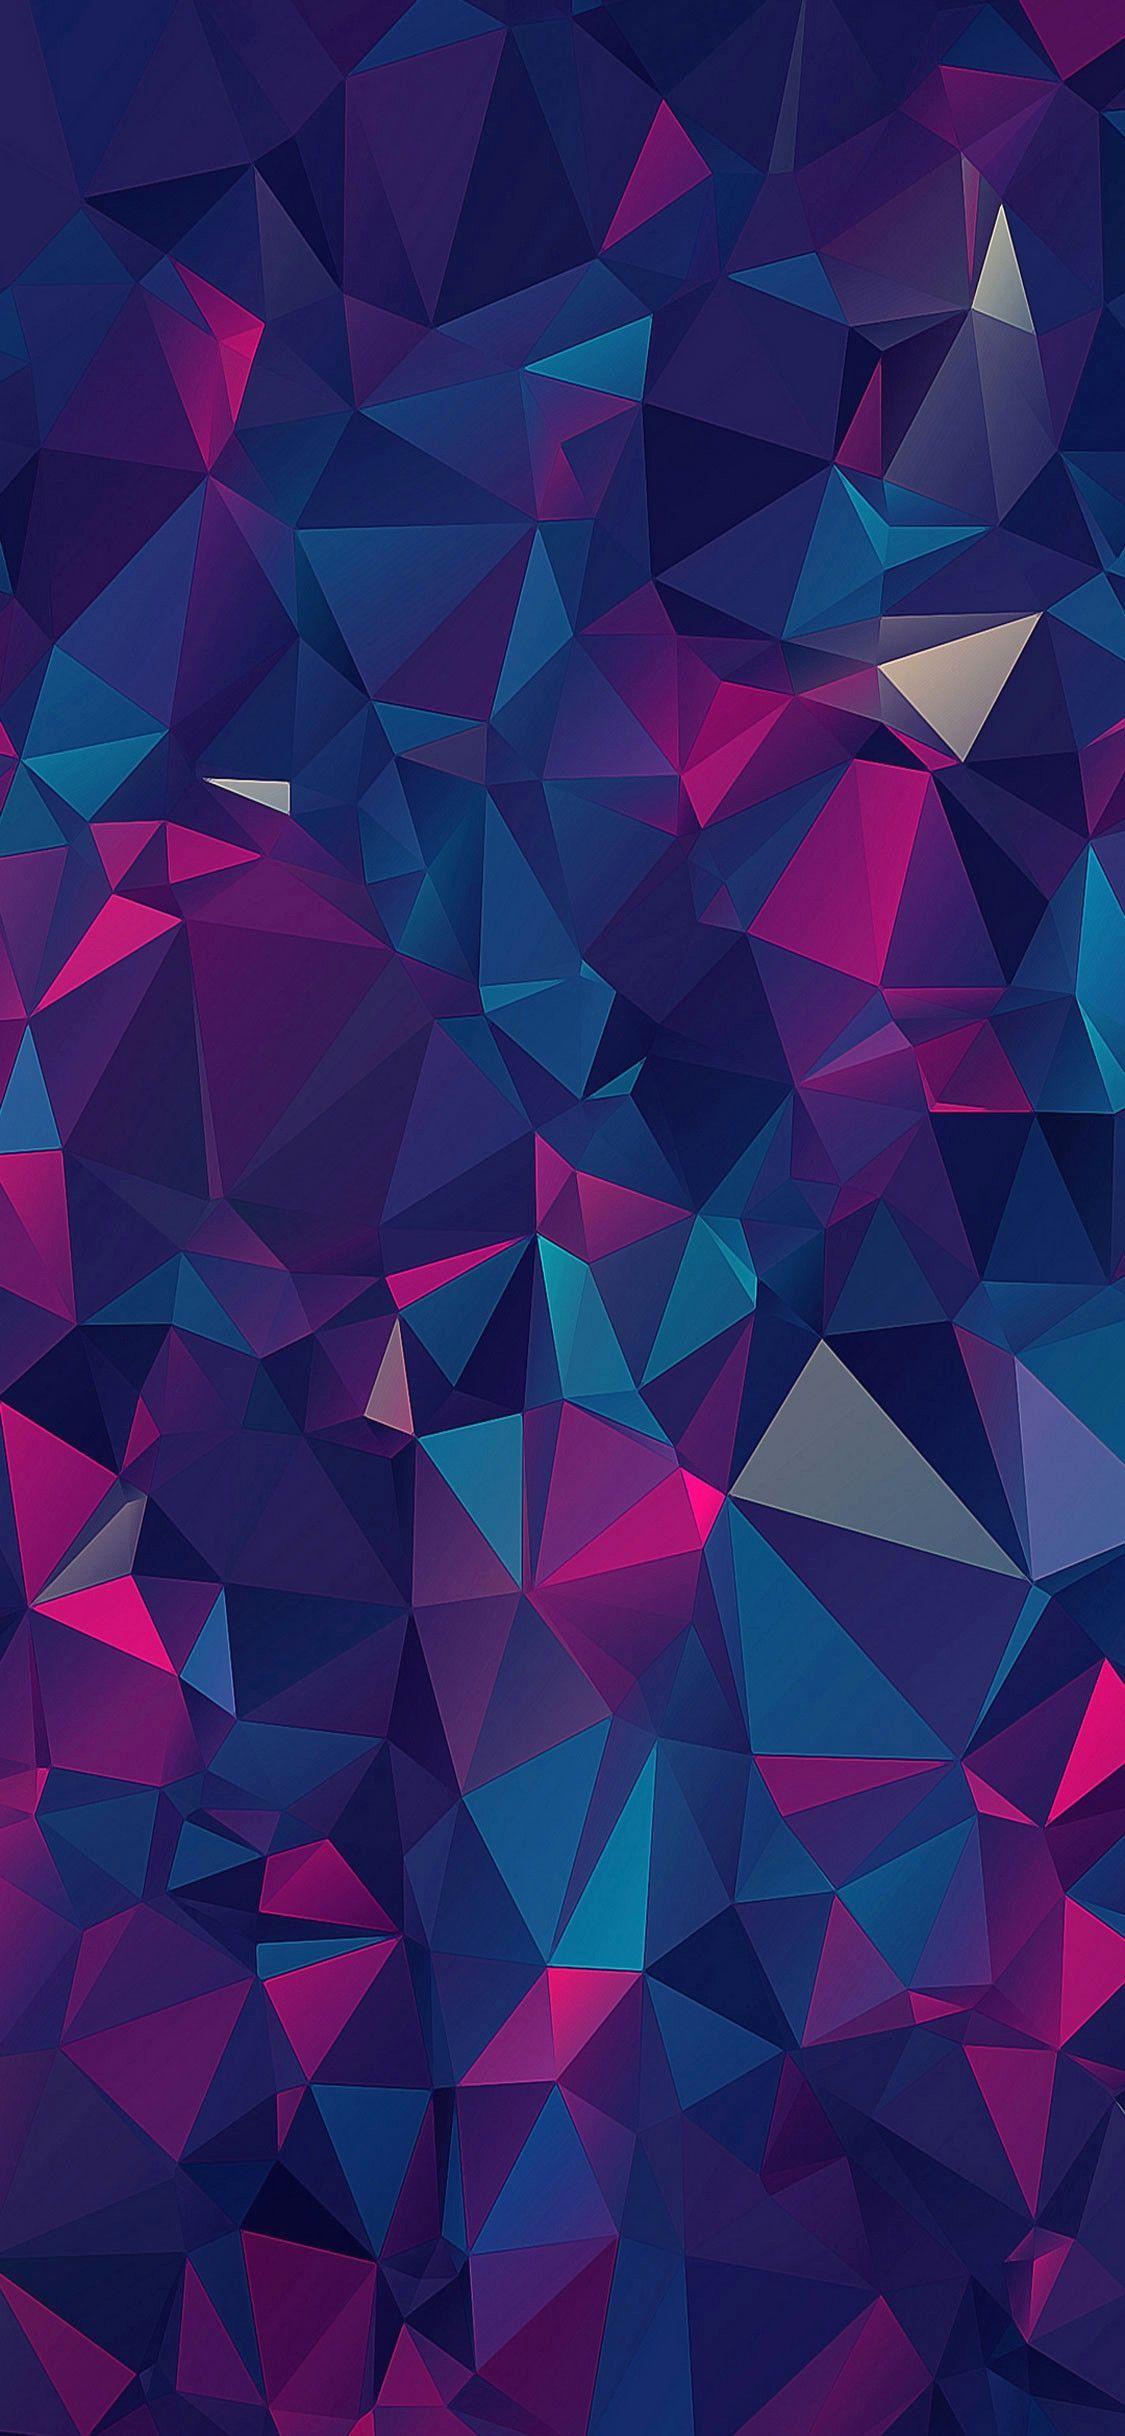 Iphone wallpaper tumblr Free highresolution hd retina